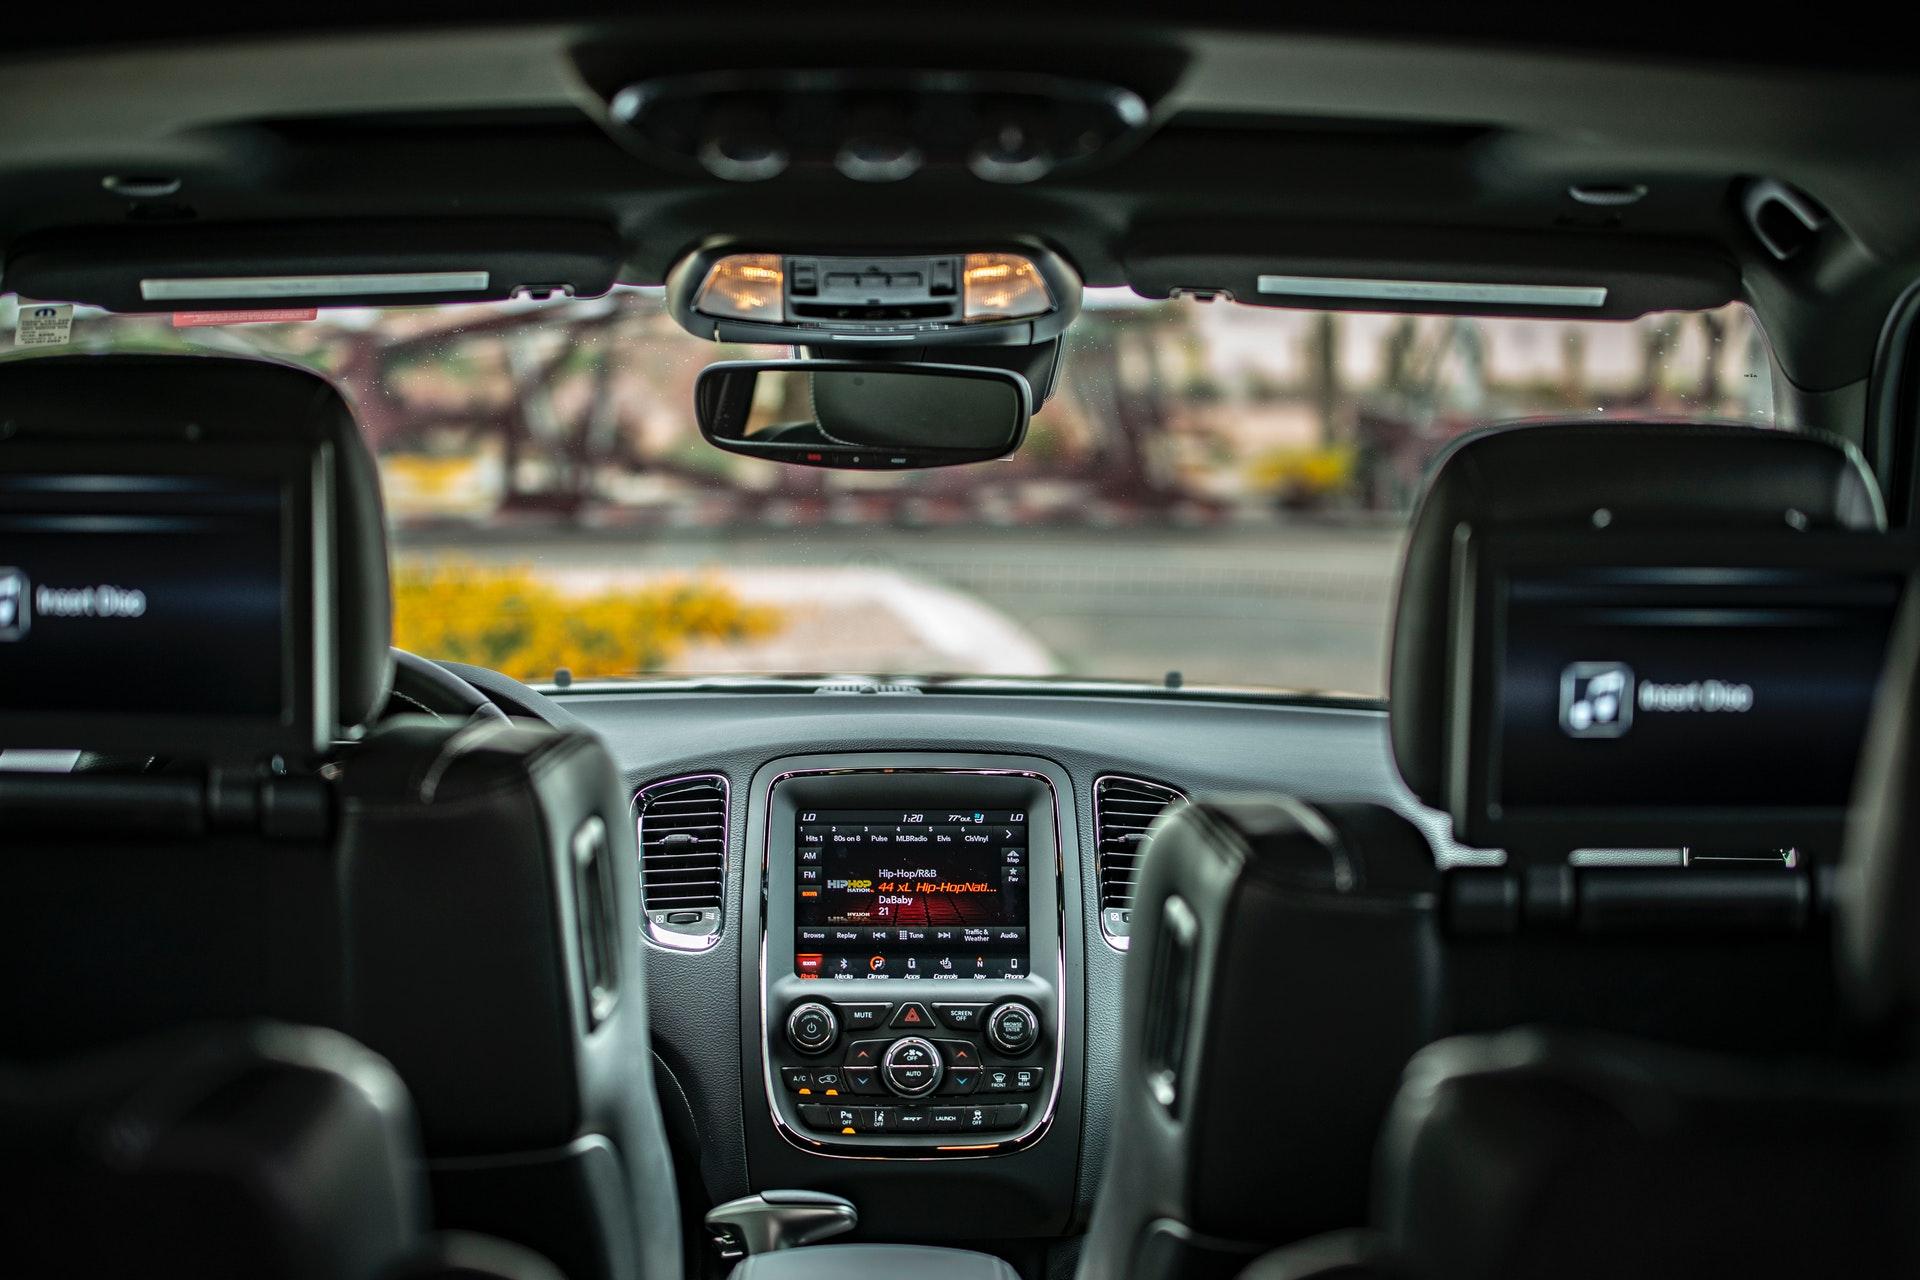 Car technology Advancement image.jpg (290 KB)